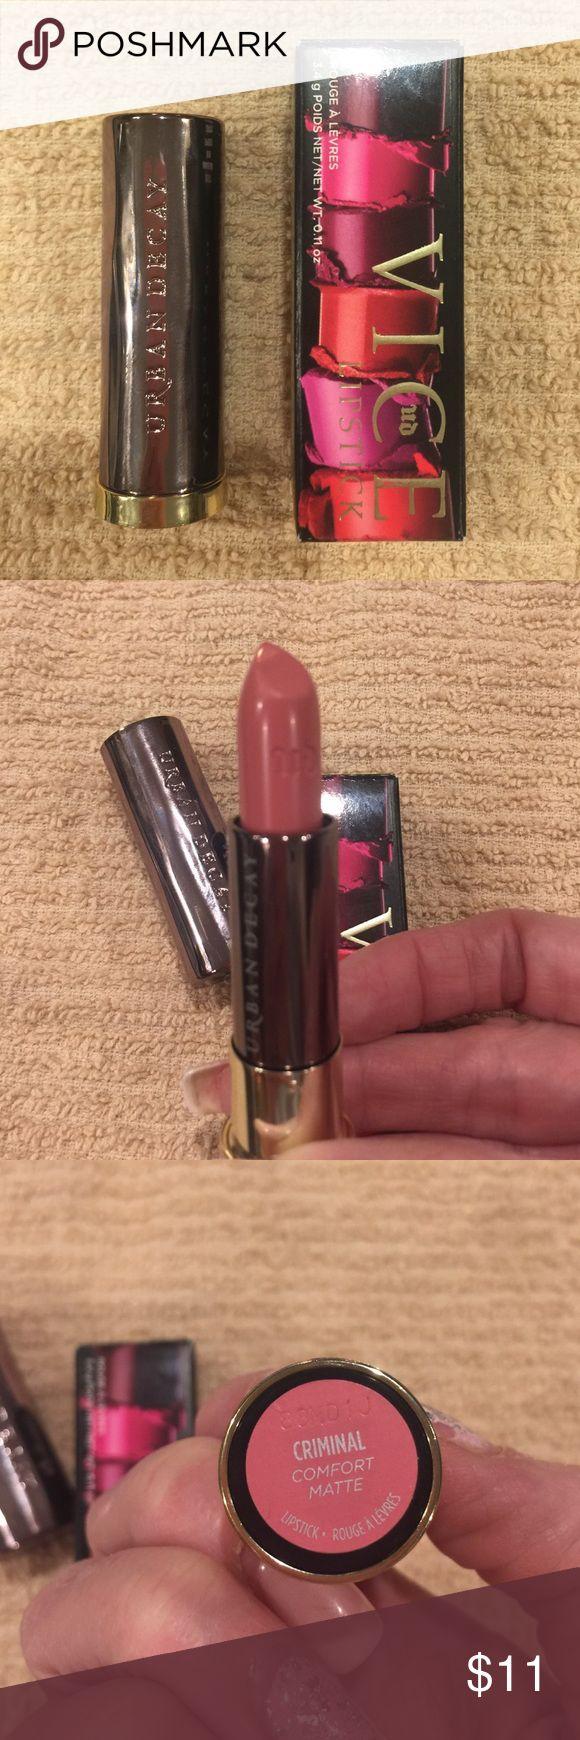 "Urban Decay Lipstick Brand new! Urban Decay (Comfort Matte) Vice Lipstick in ""Criminal"" Urban Decay Makeup Lipstick"